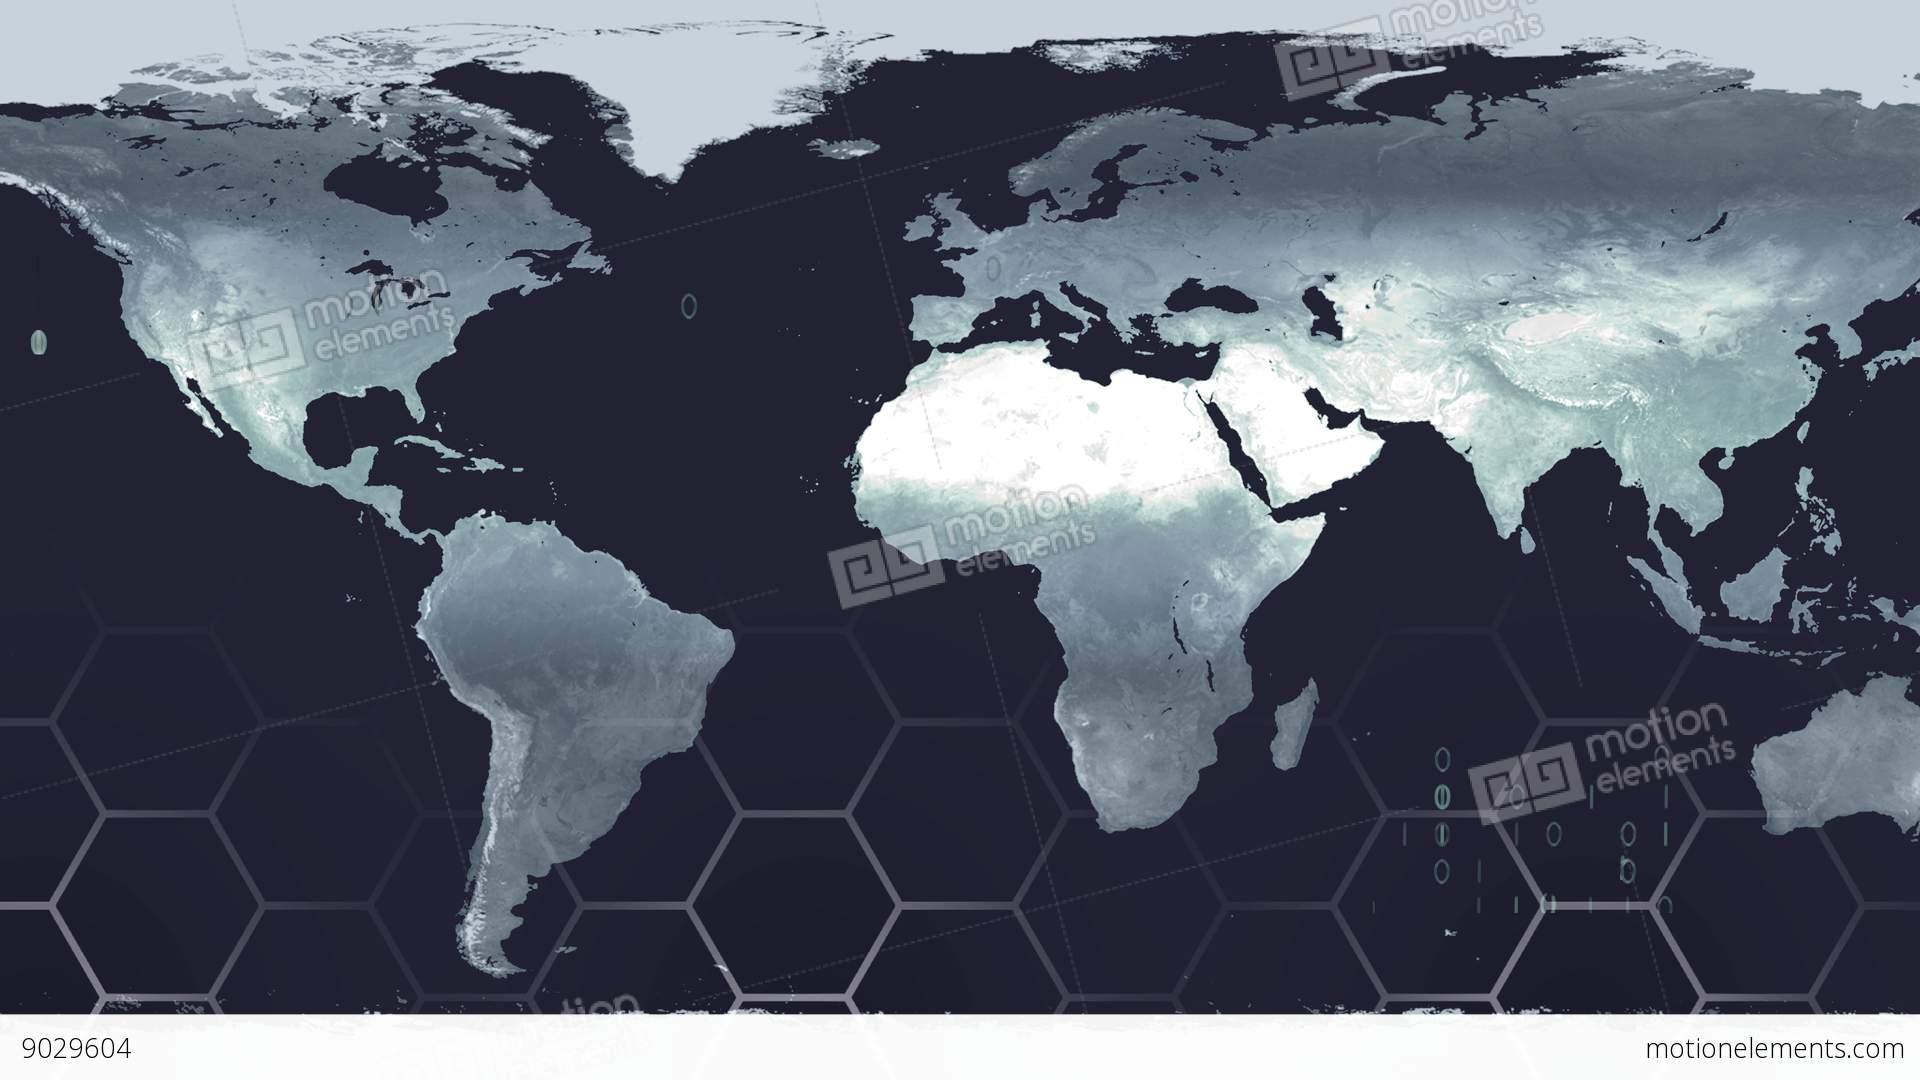 World Map High Tech Digital Satellite Data View War Room K Stock - World map satellite hd